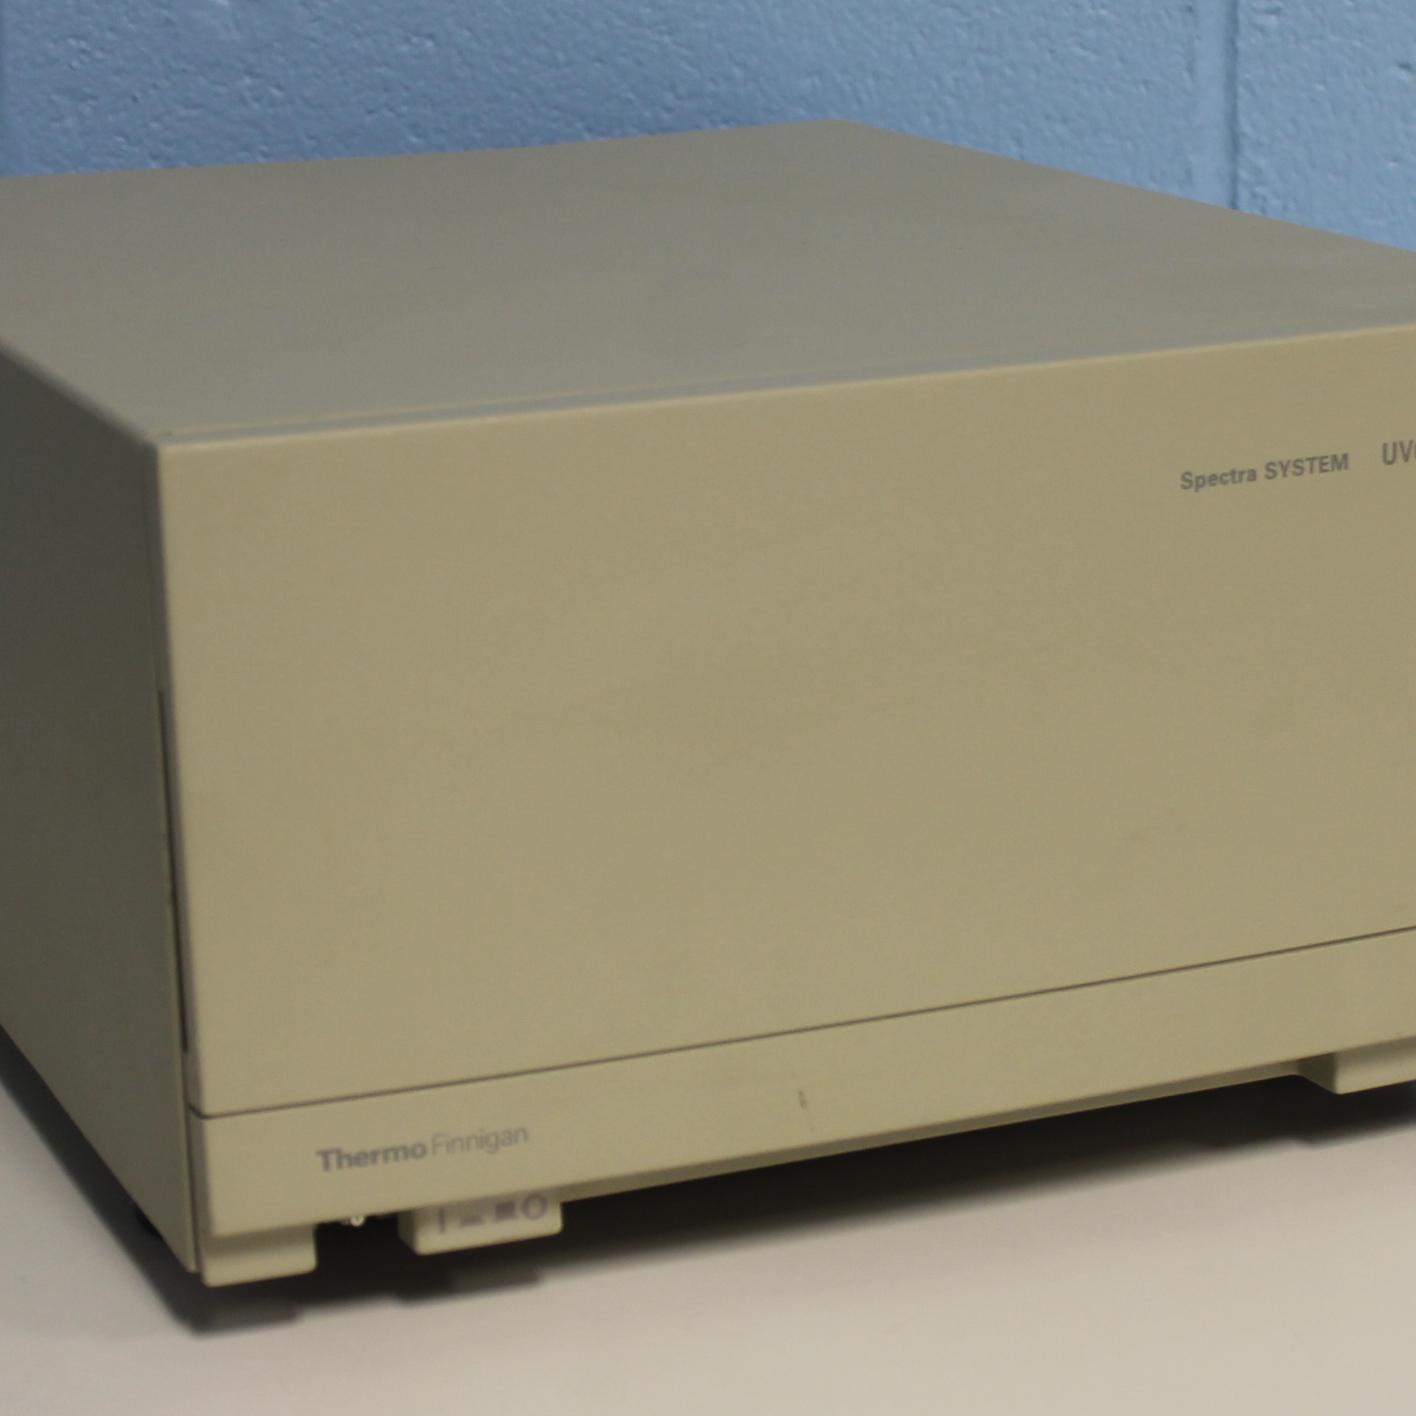 Thermo Finnigan SpectraSYSTEM UV6000LP Detector Image